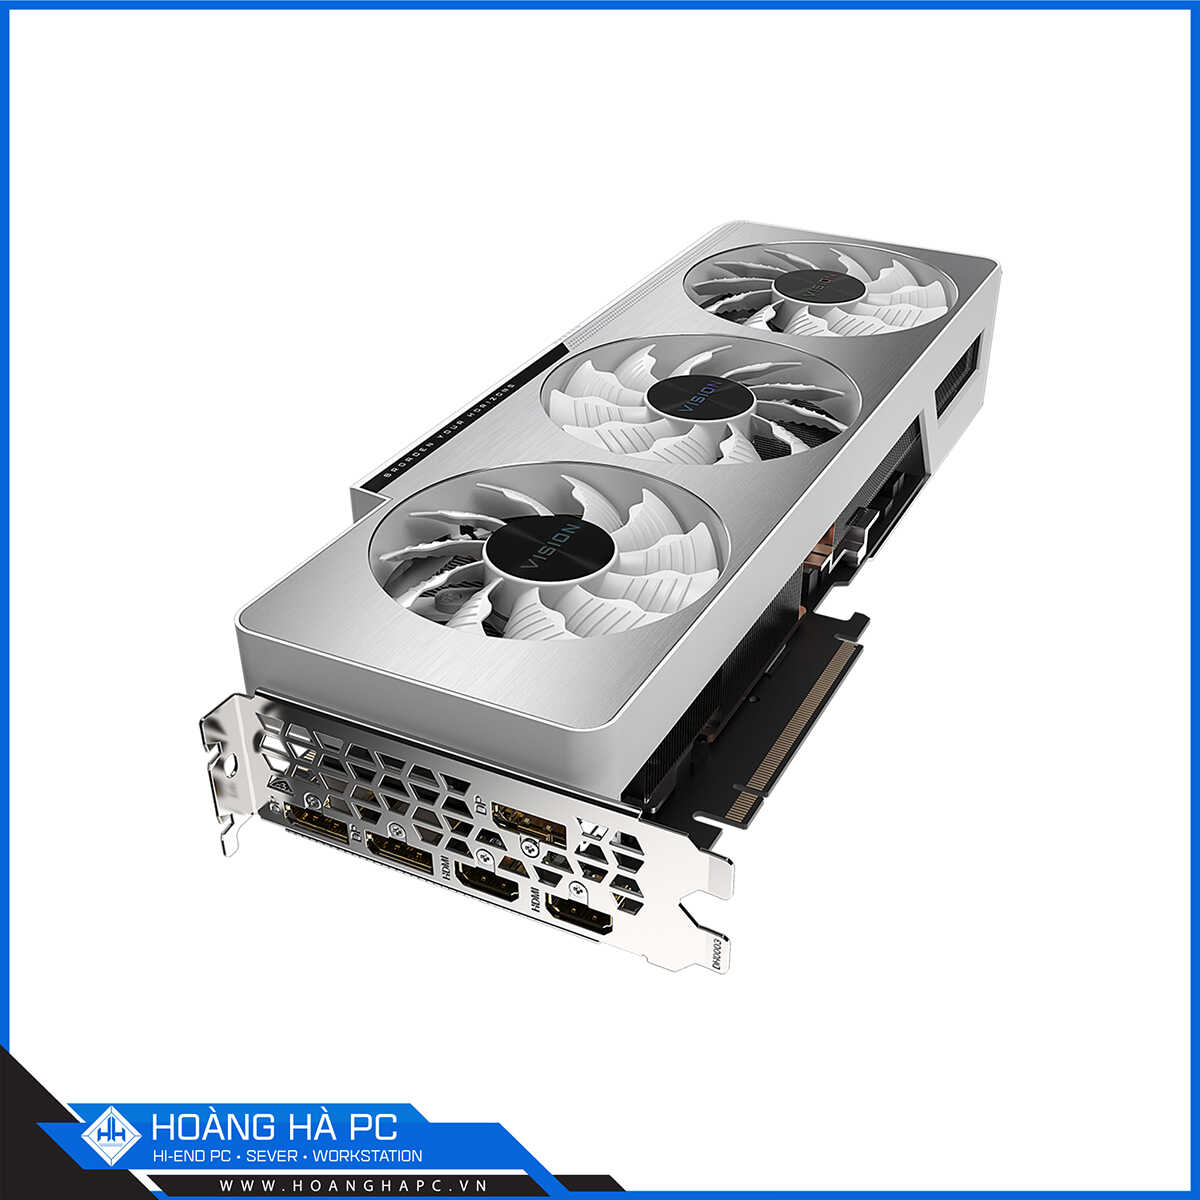 VGA Gigabyte RTX 3080 VISION OC 10G